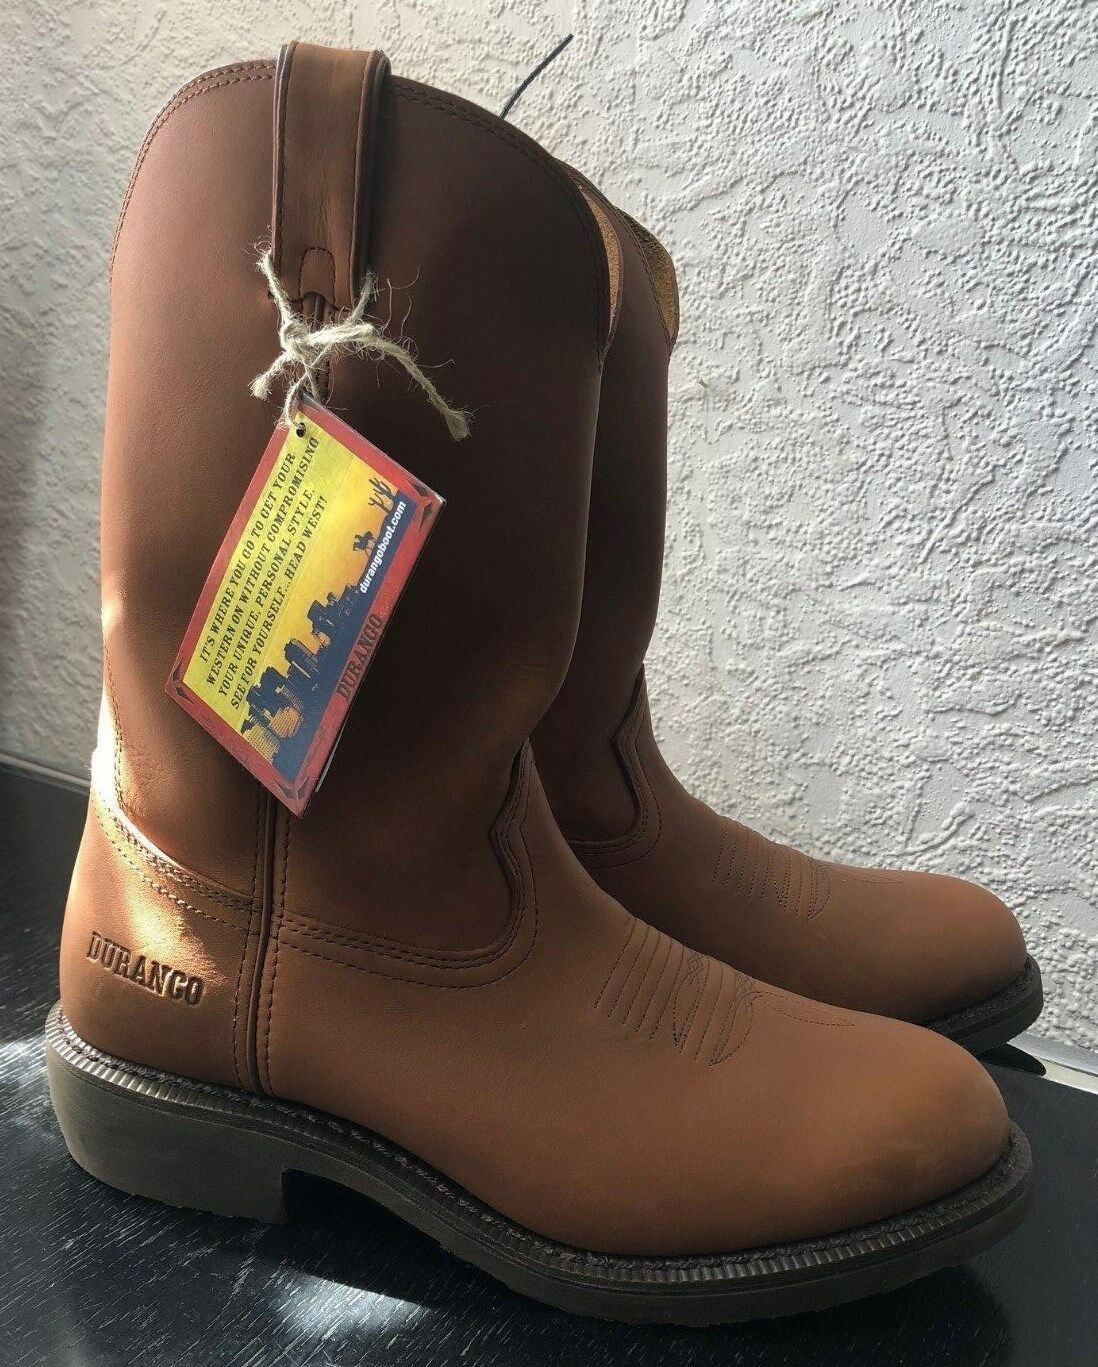 Durango Stiefel Stiefel Westernstiefel Durango Gr. 45    | Wunderbar